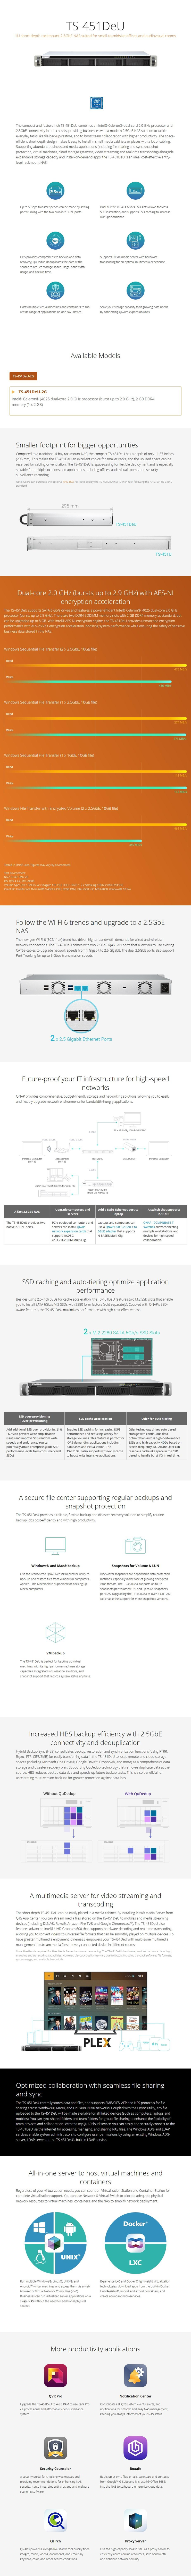 QNAP TS-451DeU-2G 4-Bay 1U Diskless NAS Celeron J4025 2 Core 2.0GHz 2GB RAM - Overview 1